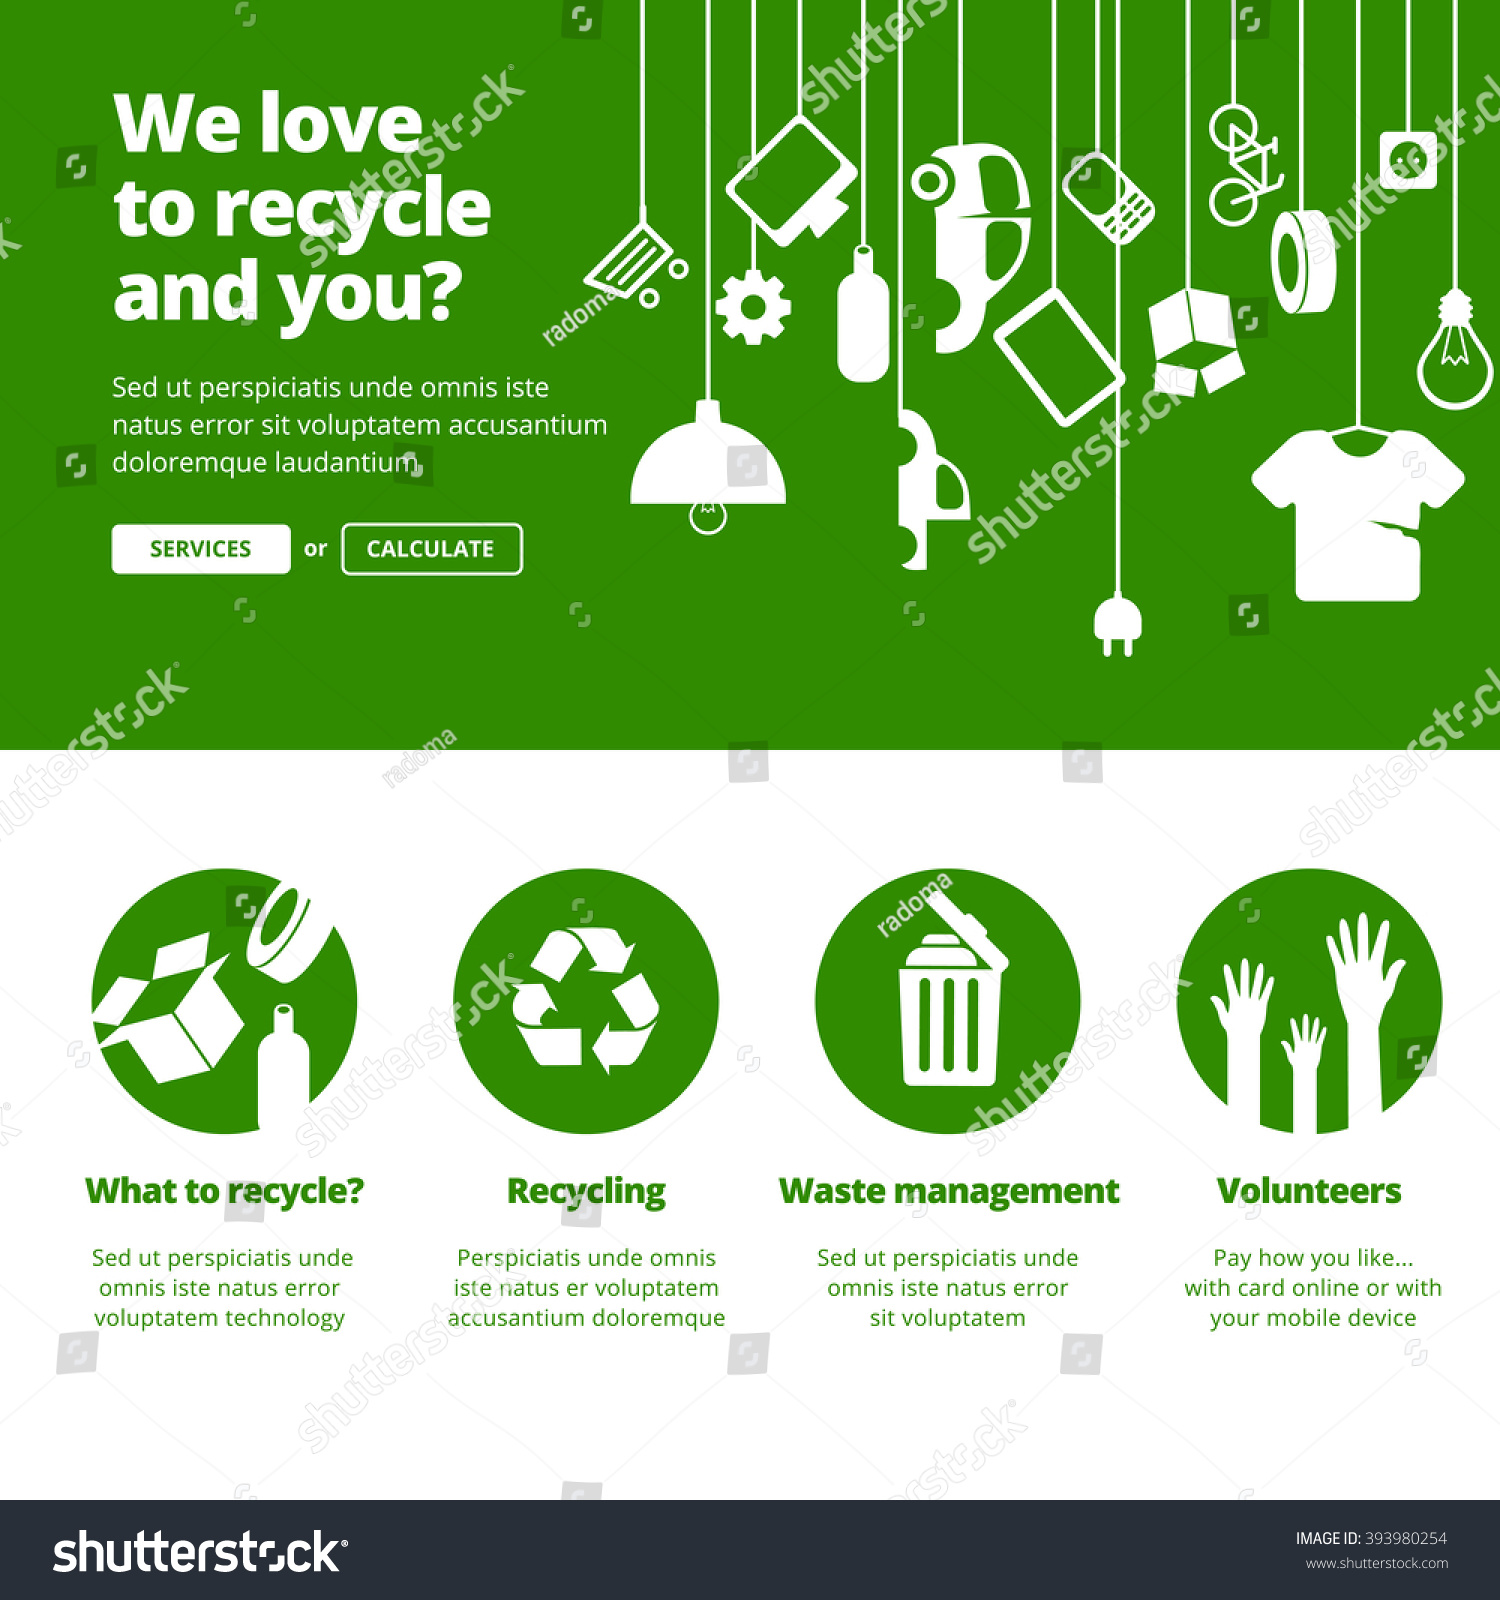 waste management term papers Assessment of waste management strategies in nigerian universities - assessment of waste management in the university of calaber nigeria - kenobi krukru - bachelor.